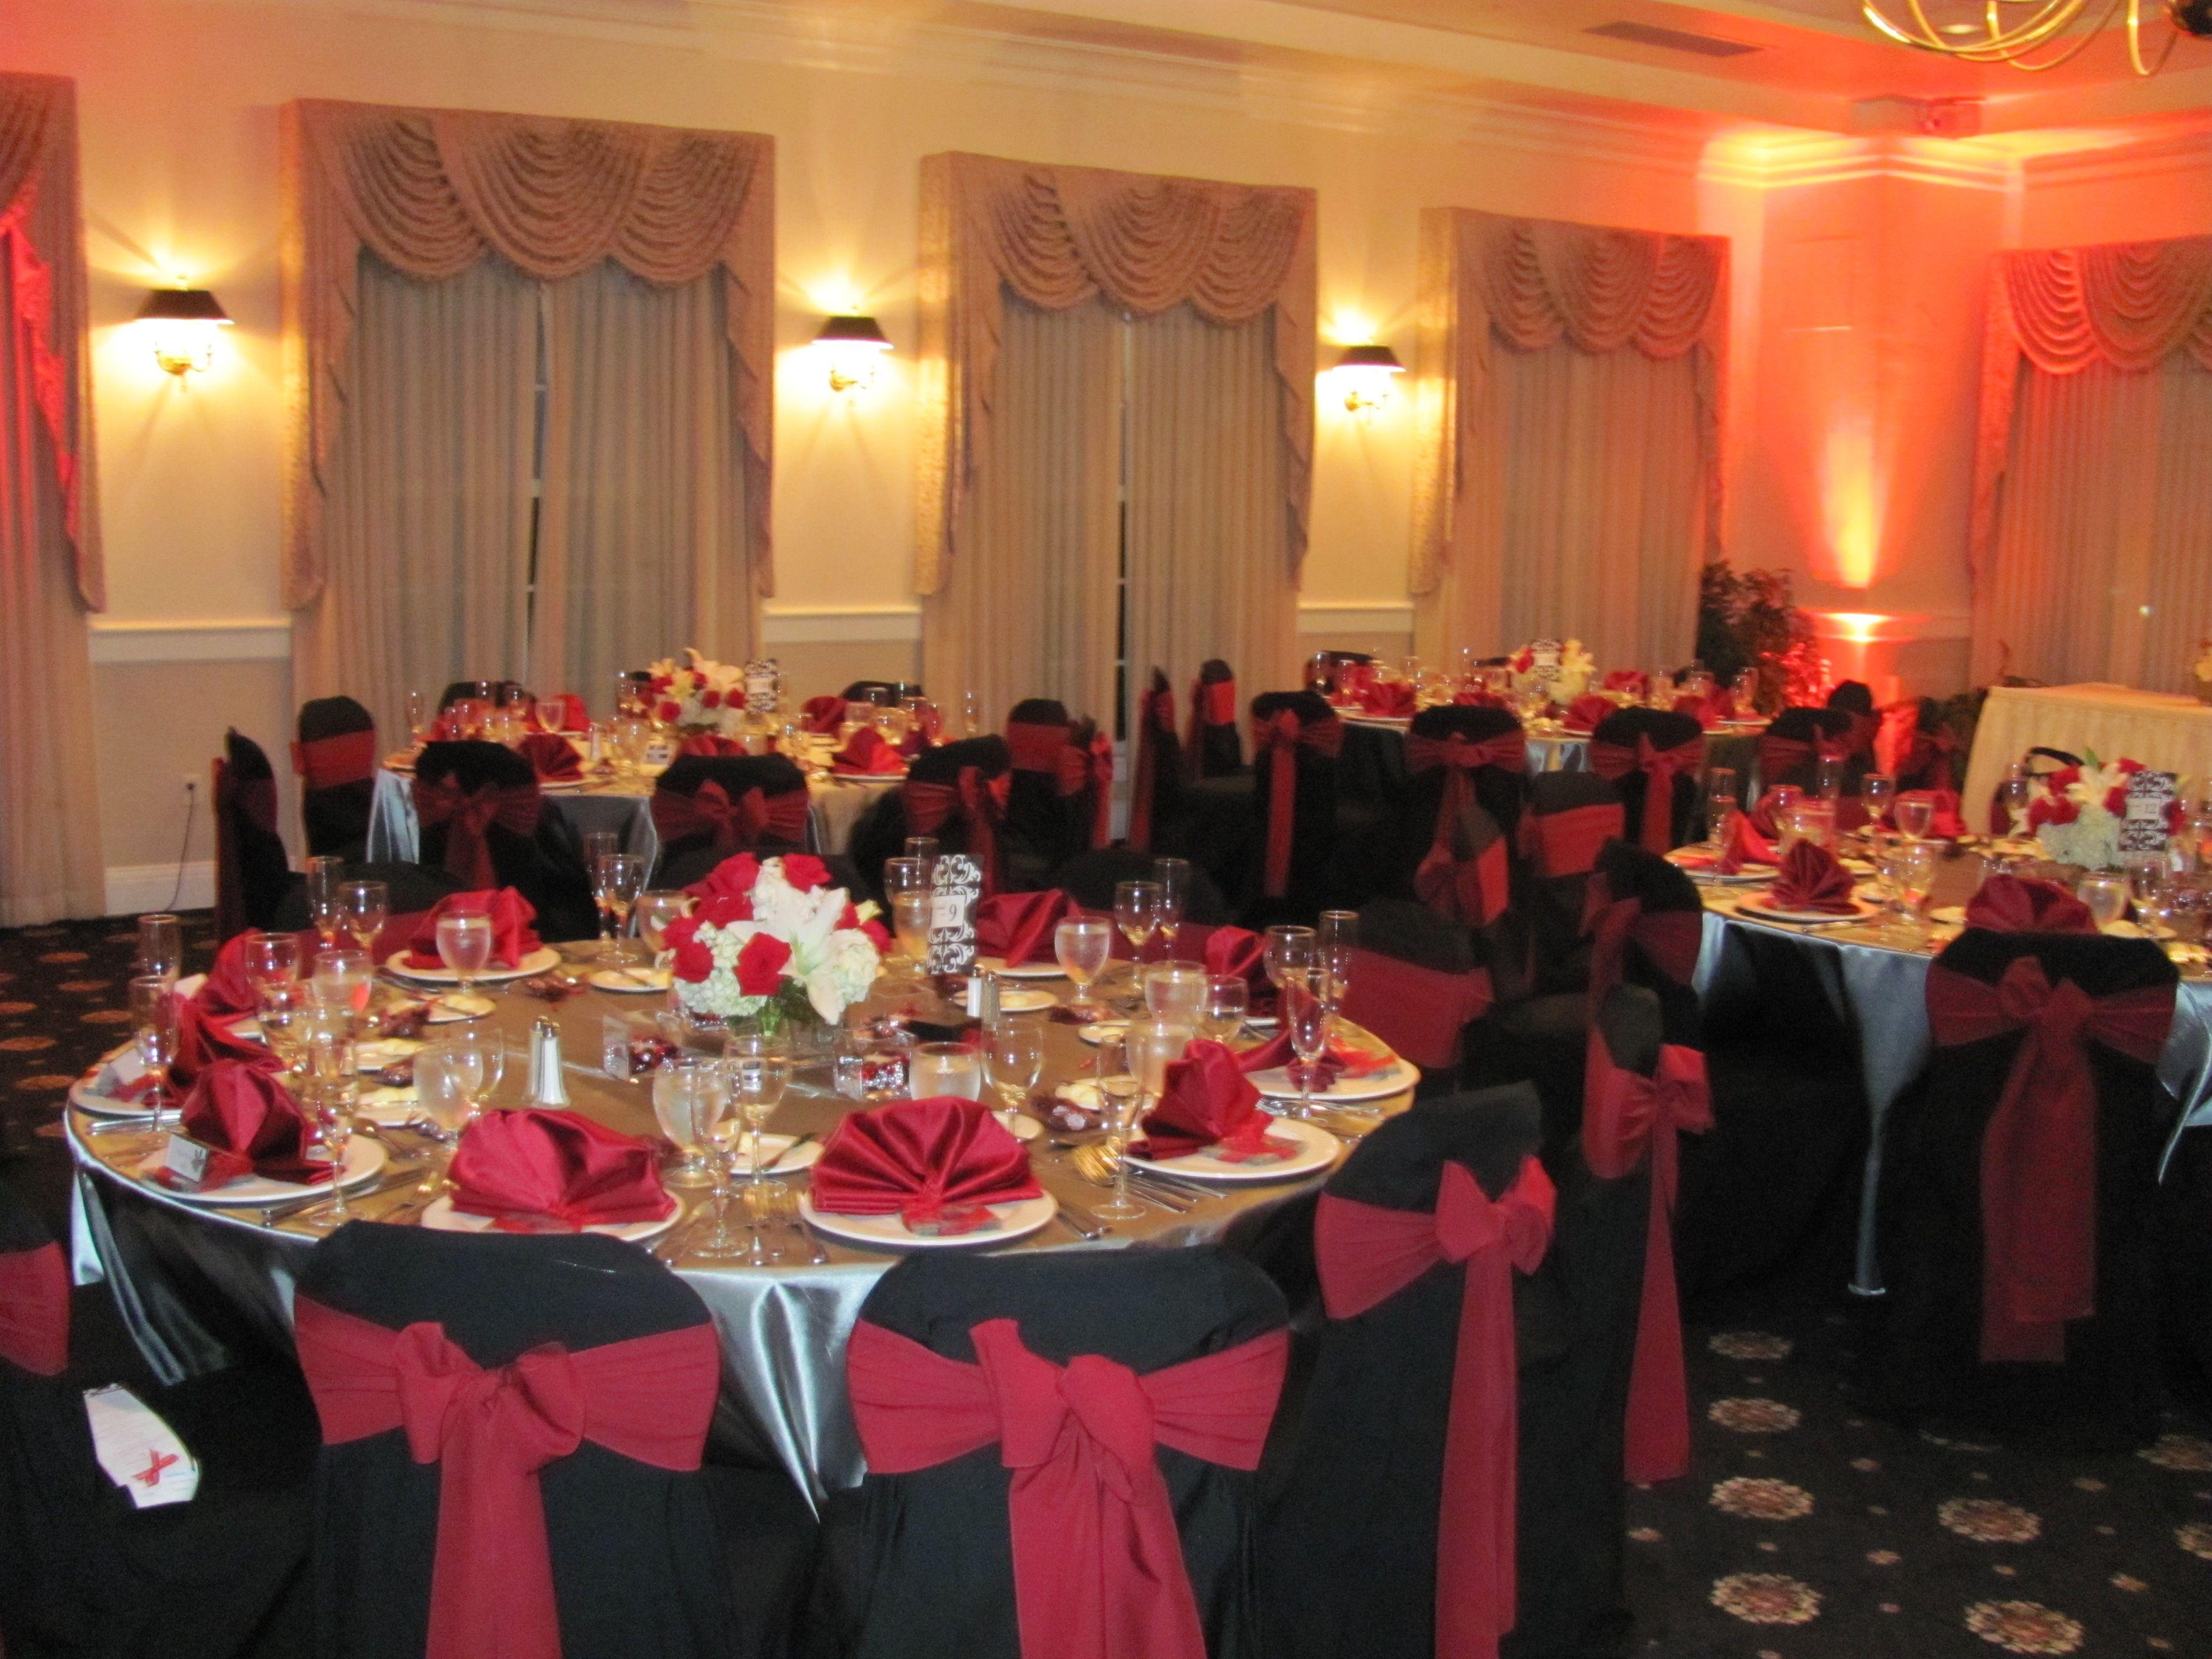 Wedding decorations red  Red and Black Wedding Decor  Julie Pins  Pinterest  Wedding